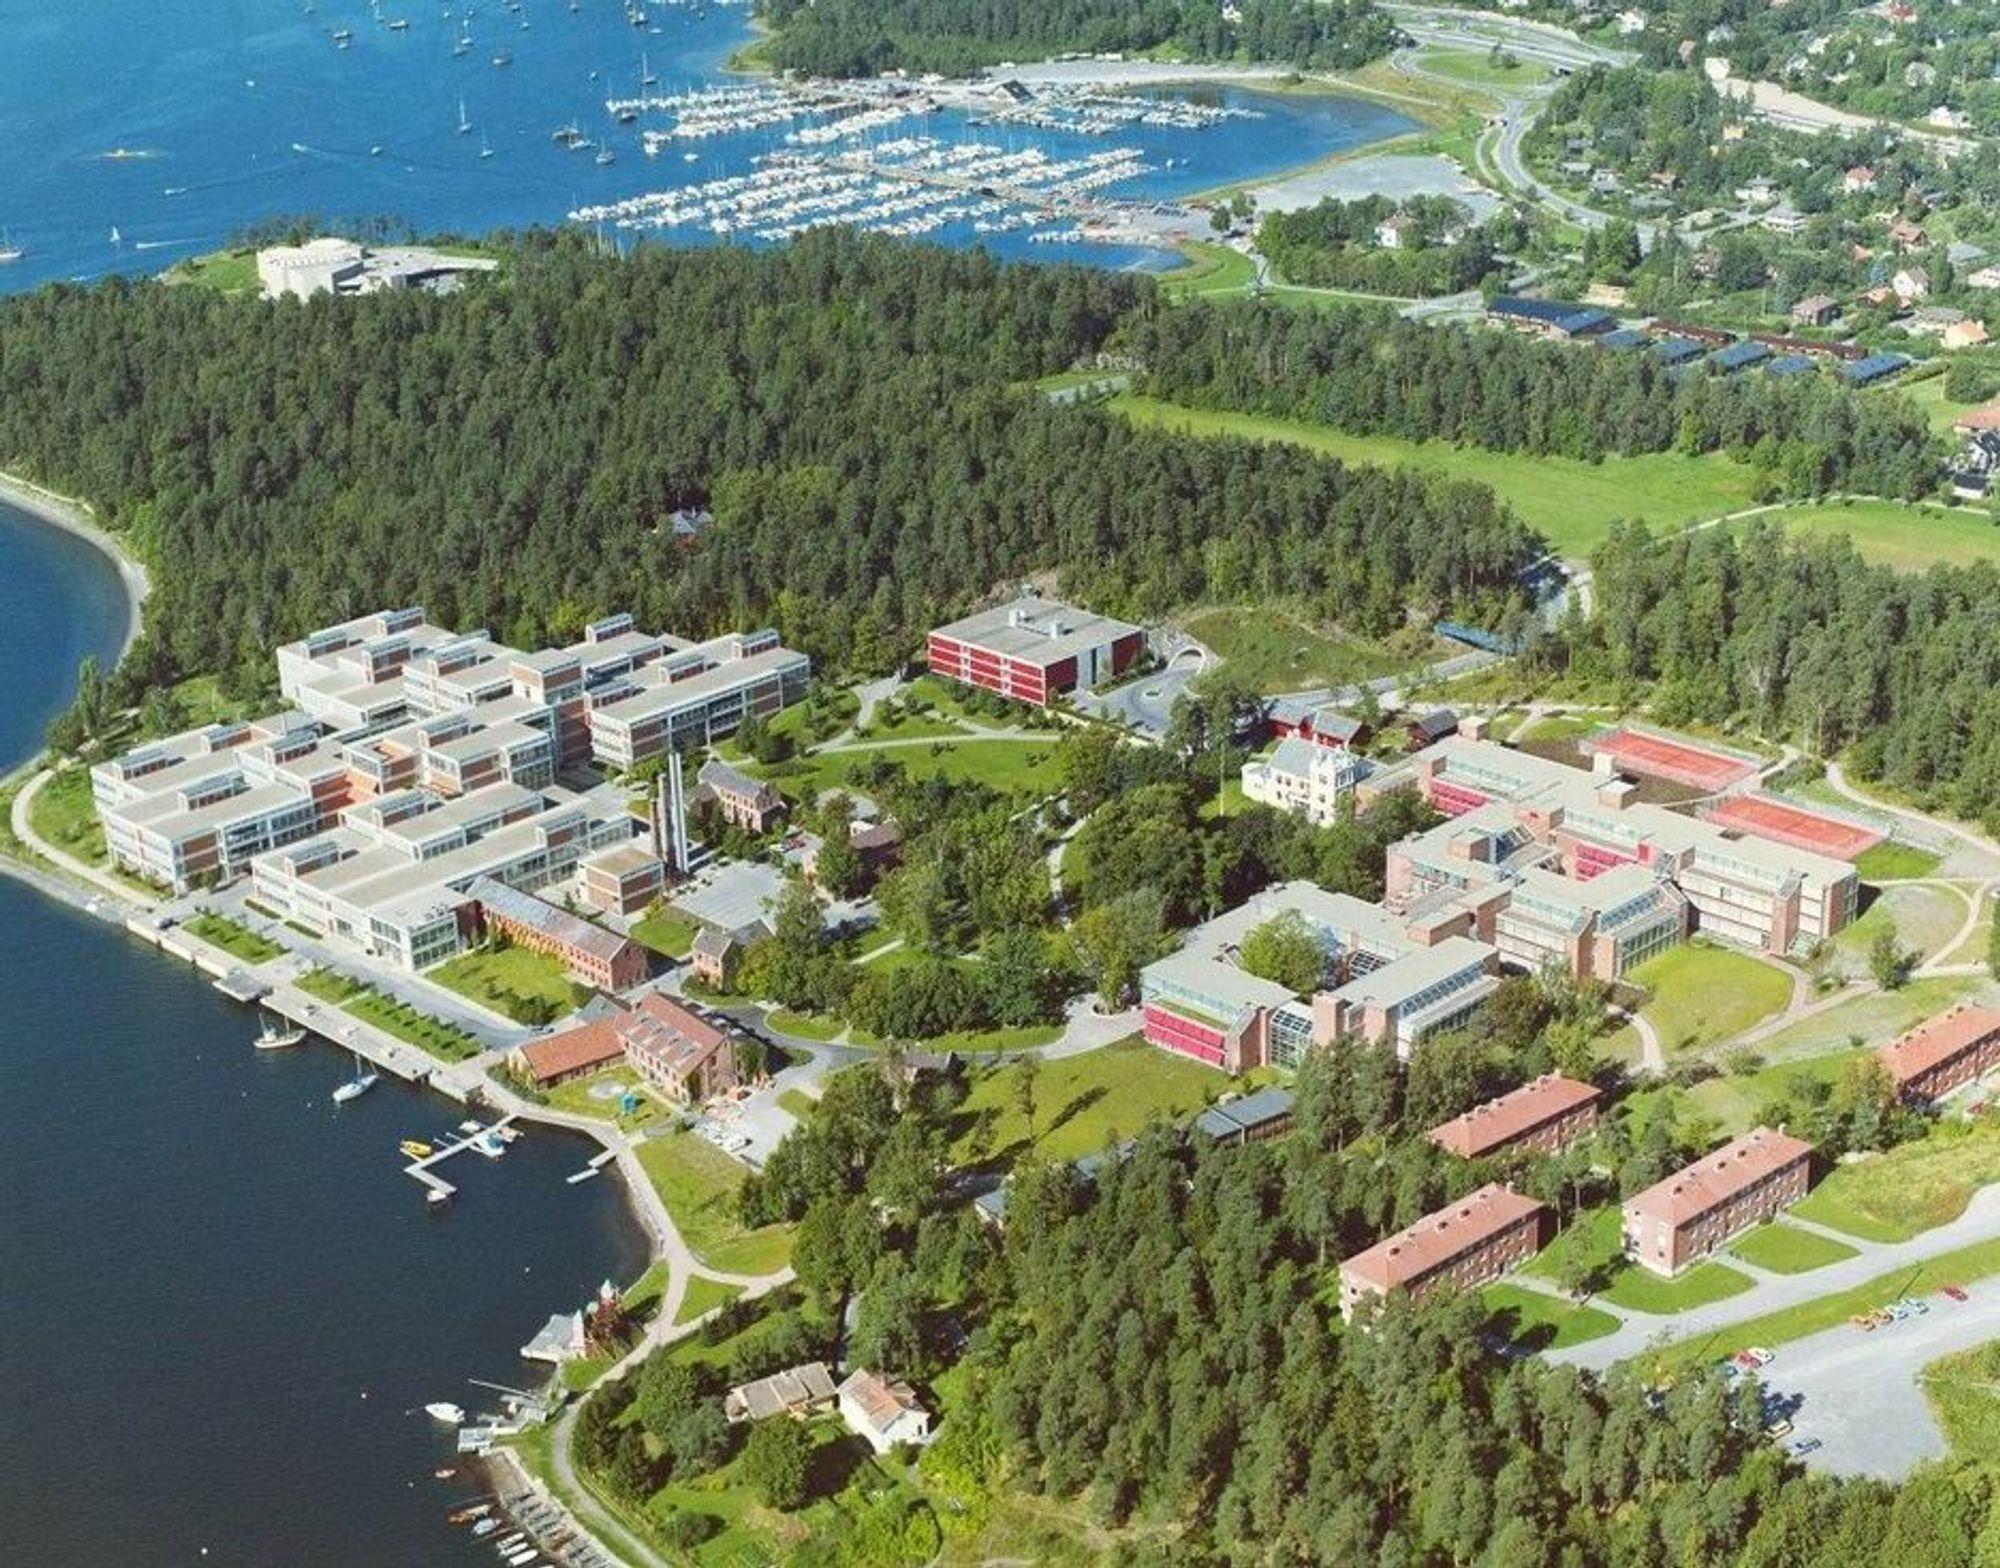 Illustrasjonsfoto: Det Norske Veritas'  hovedkontor på Høvik.